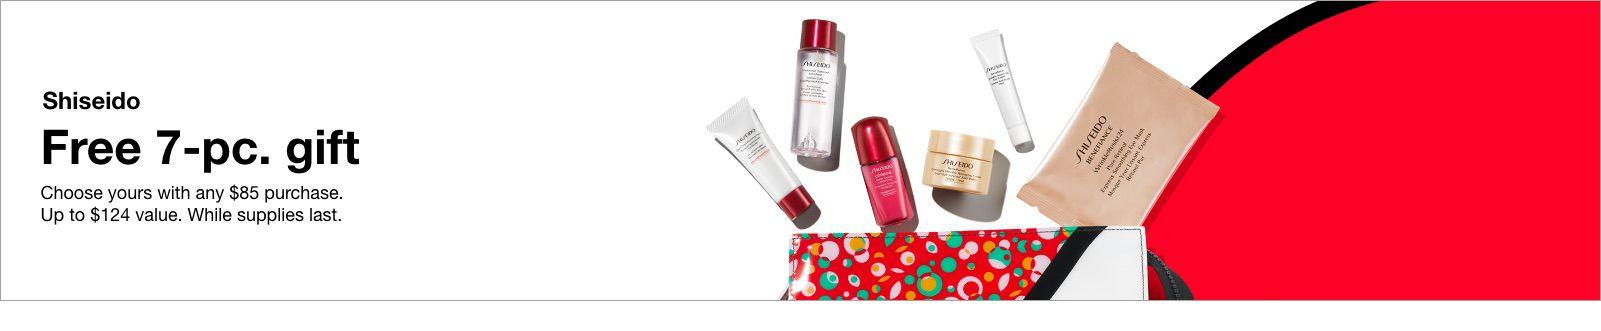 Shiseido, Free 7-pc, gift